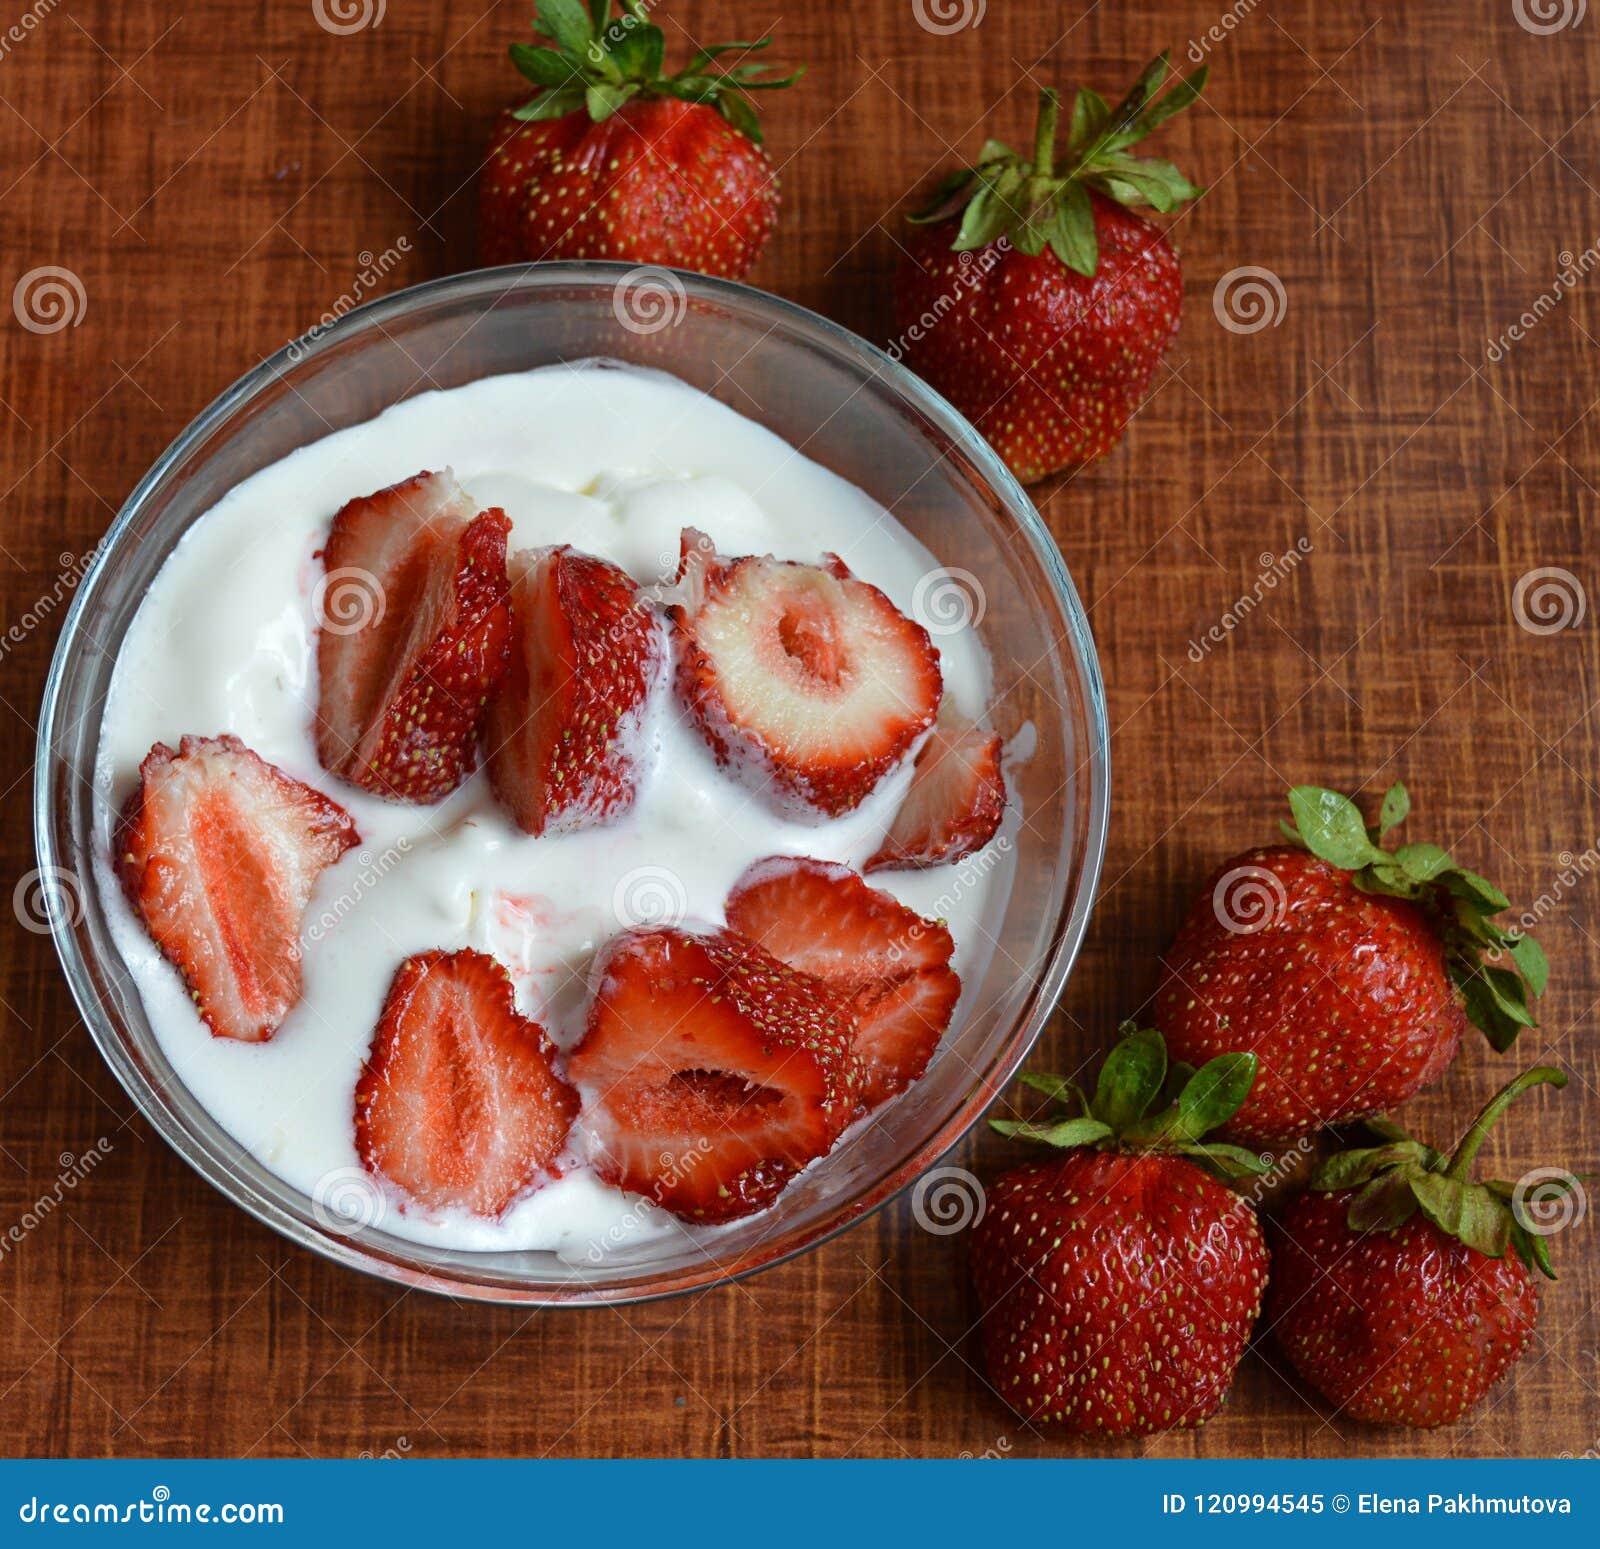 Strawberry, fruit, food, dessert, berry, fresh, red, strawberries, sweet, healthy, bowl, ripe, white, cream, plate, breakfast, die